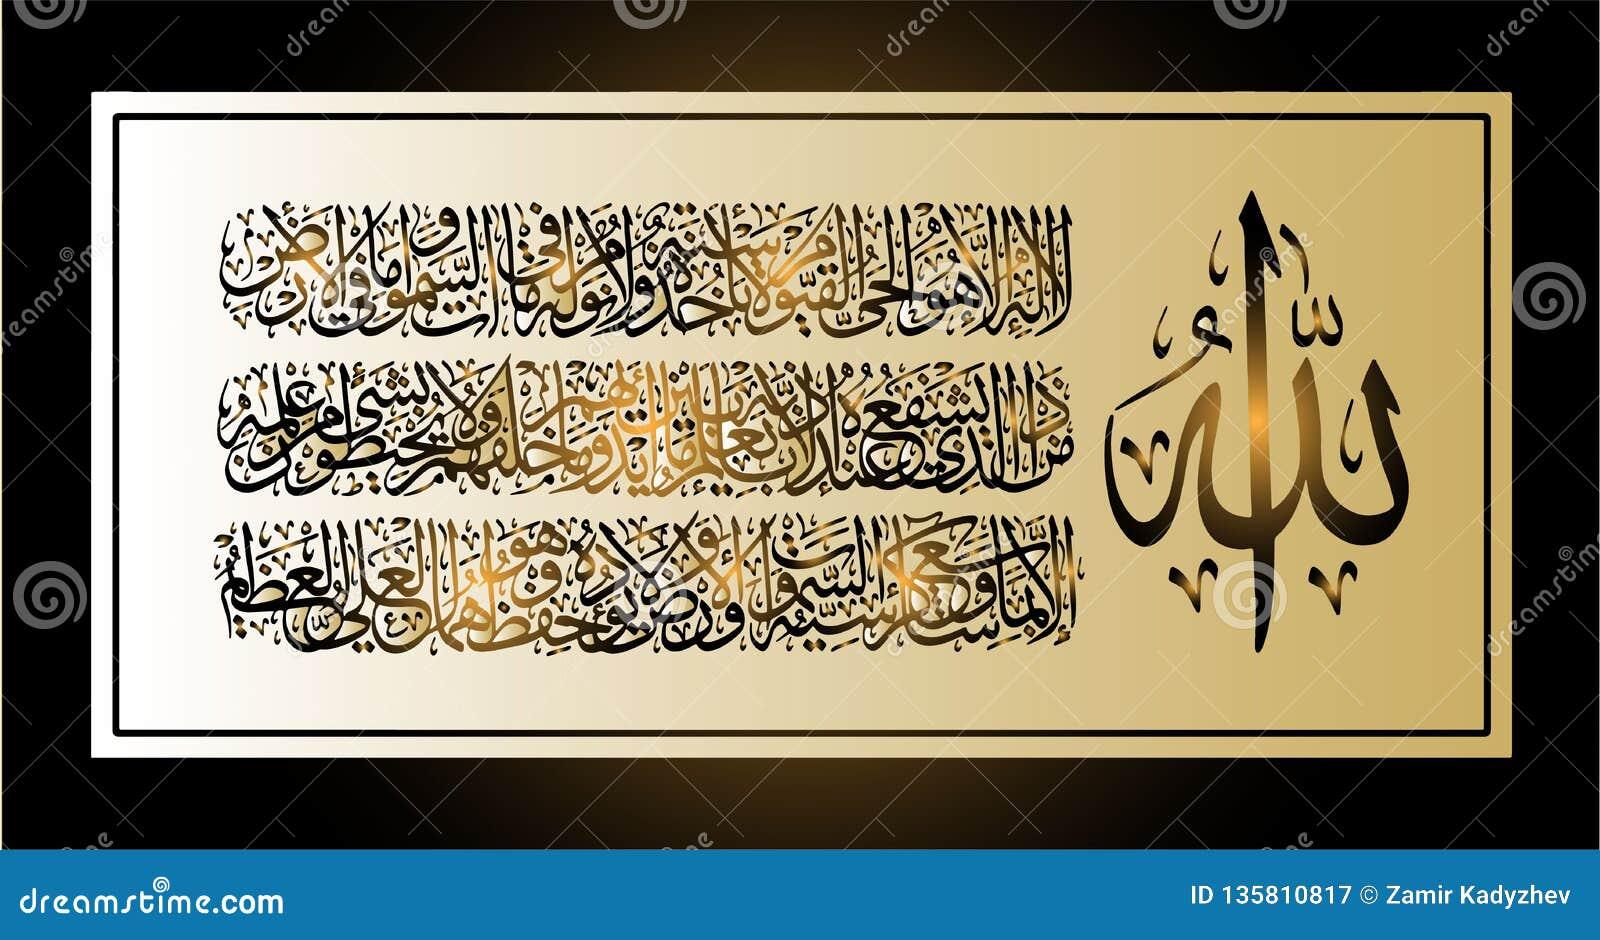 Arabic Calligraphy 255 Ayah, Sura Al Bakara Al-Kursi Means Stock